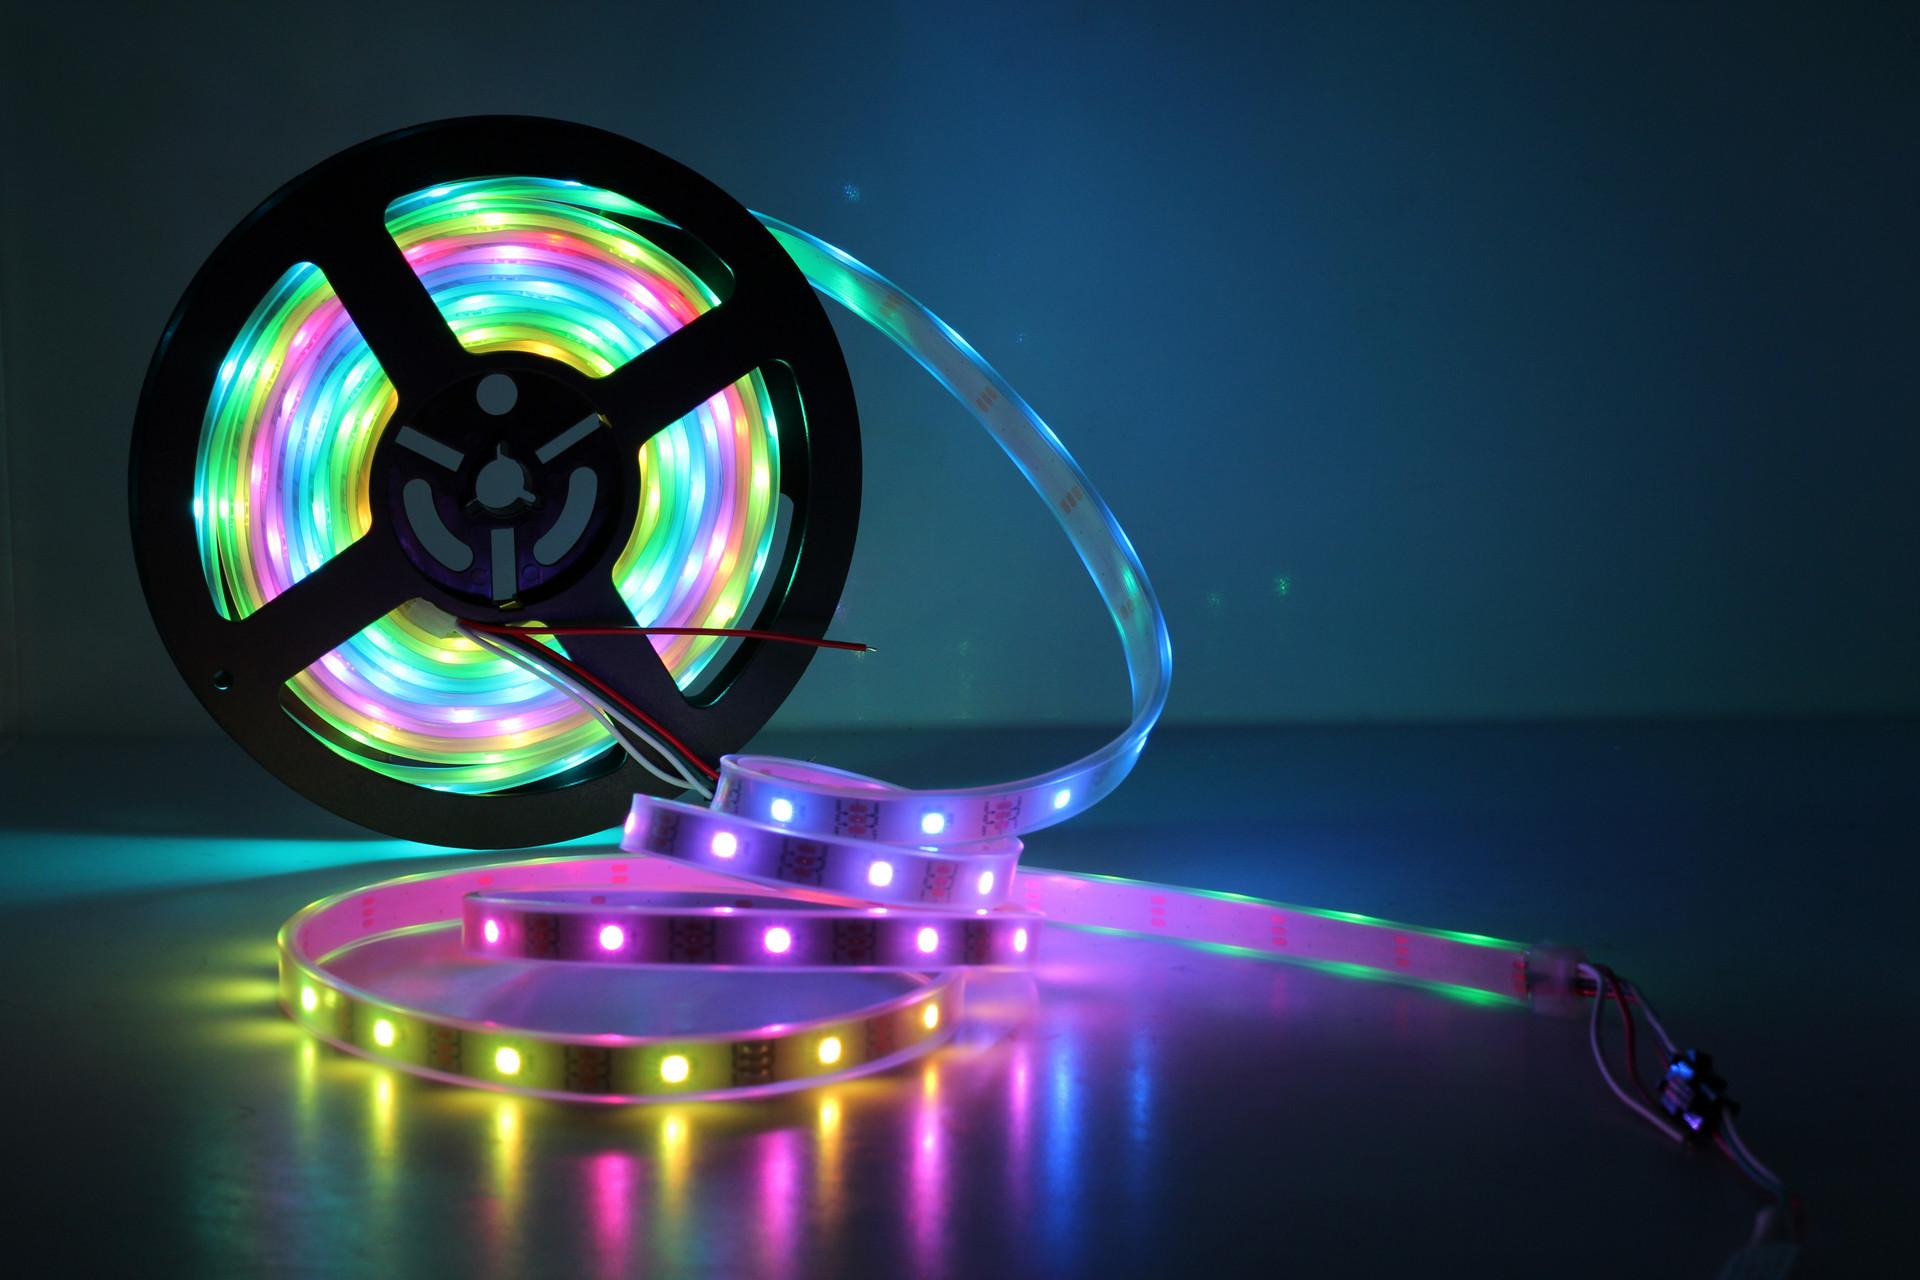 Diodes推出新款LED驱动器 简化汽车内外部照明设计